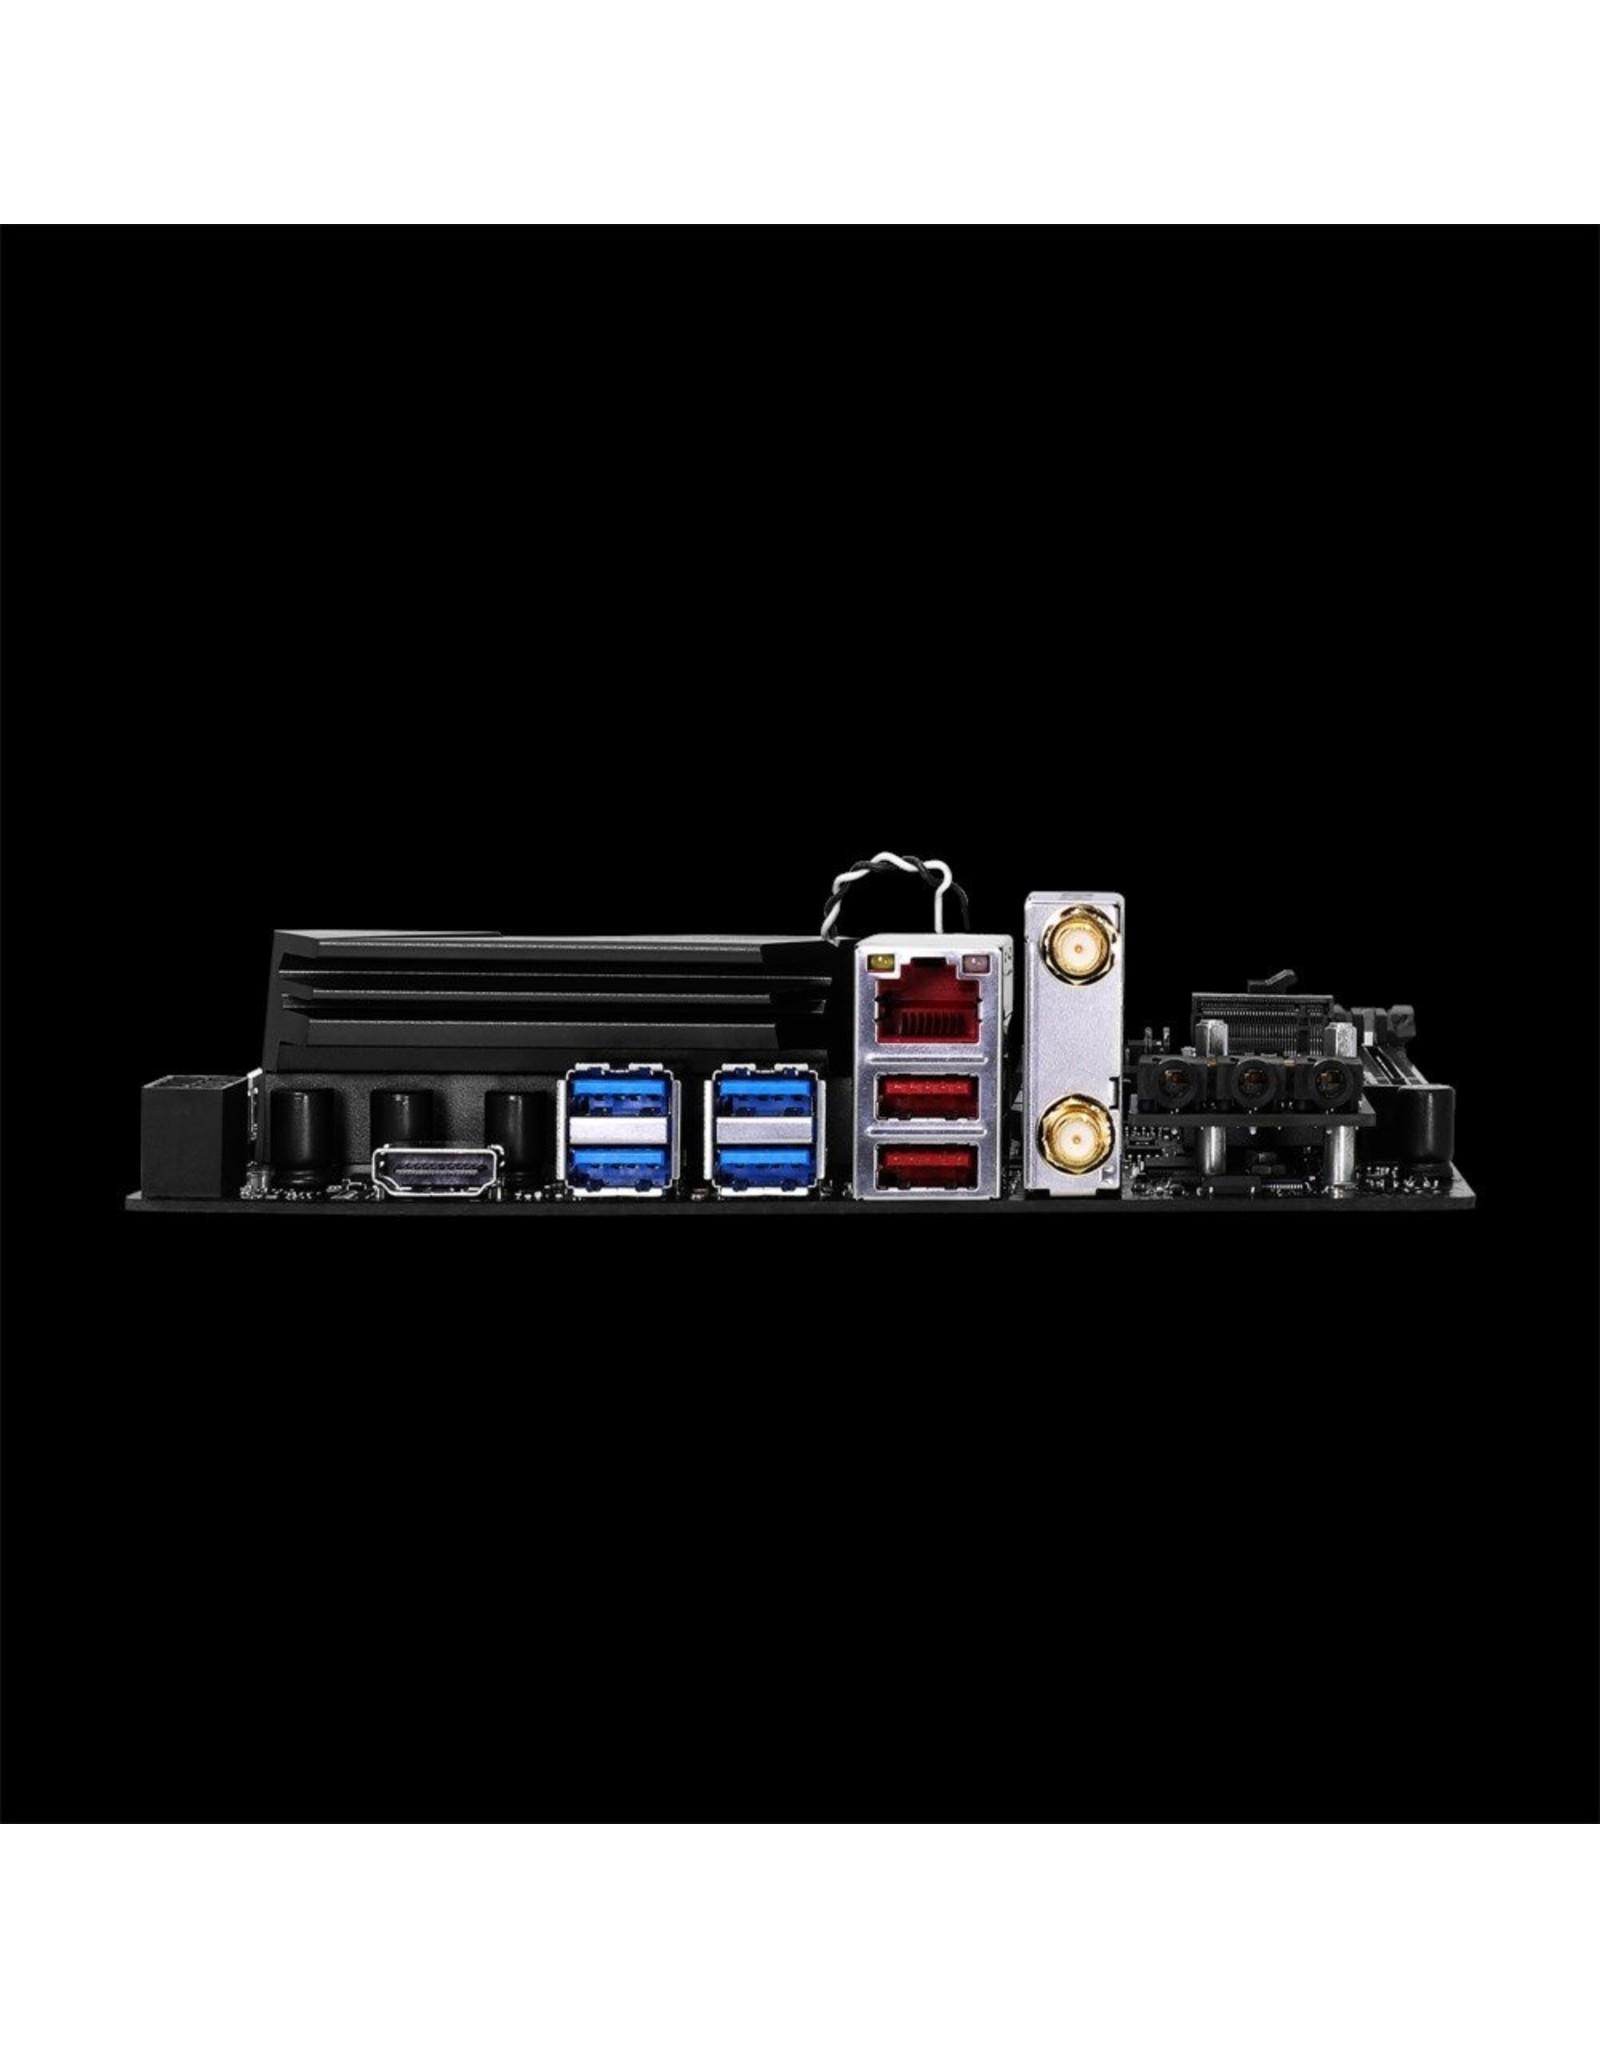 Asus MB  ROG Strix B450-I GAMING AM4 / 2x DDR4 / mITX (refurbished)